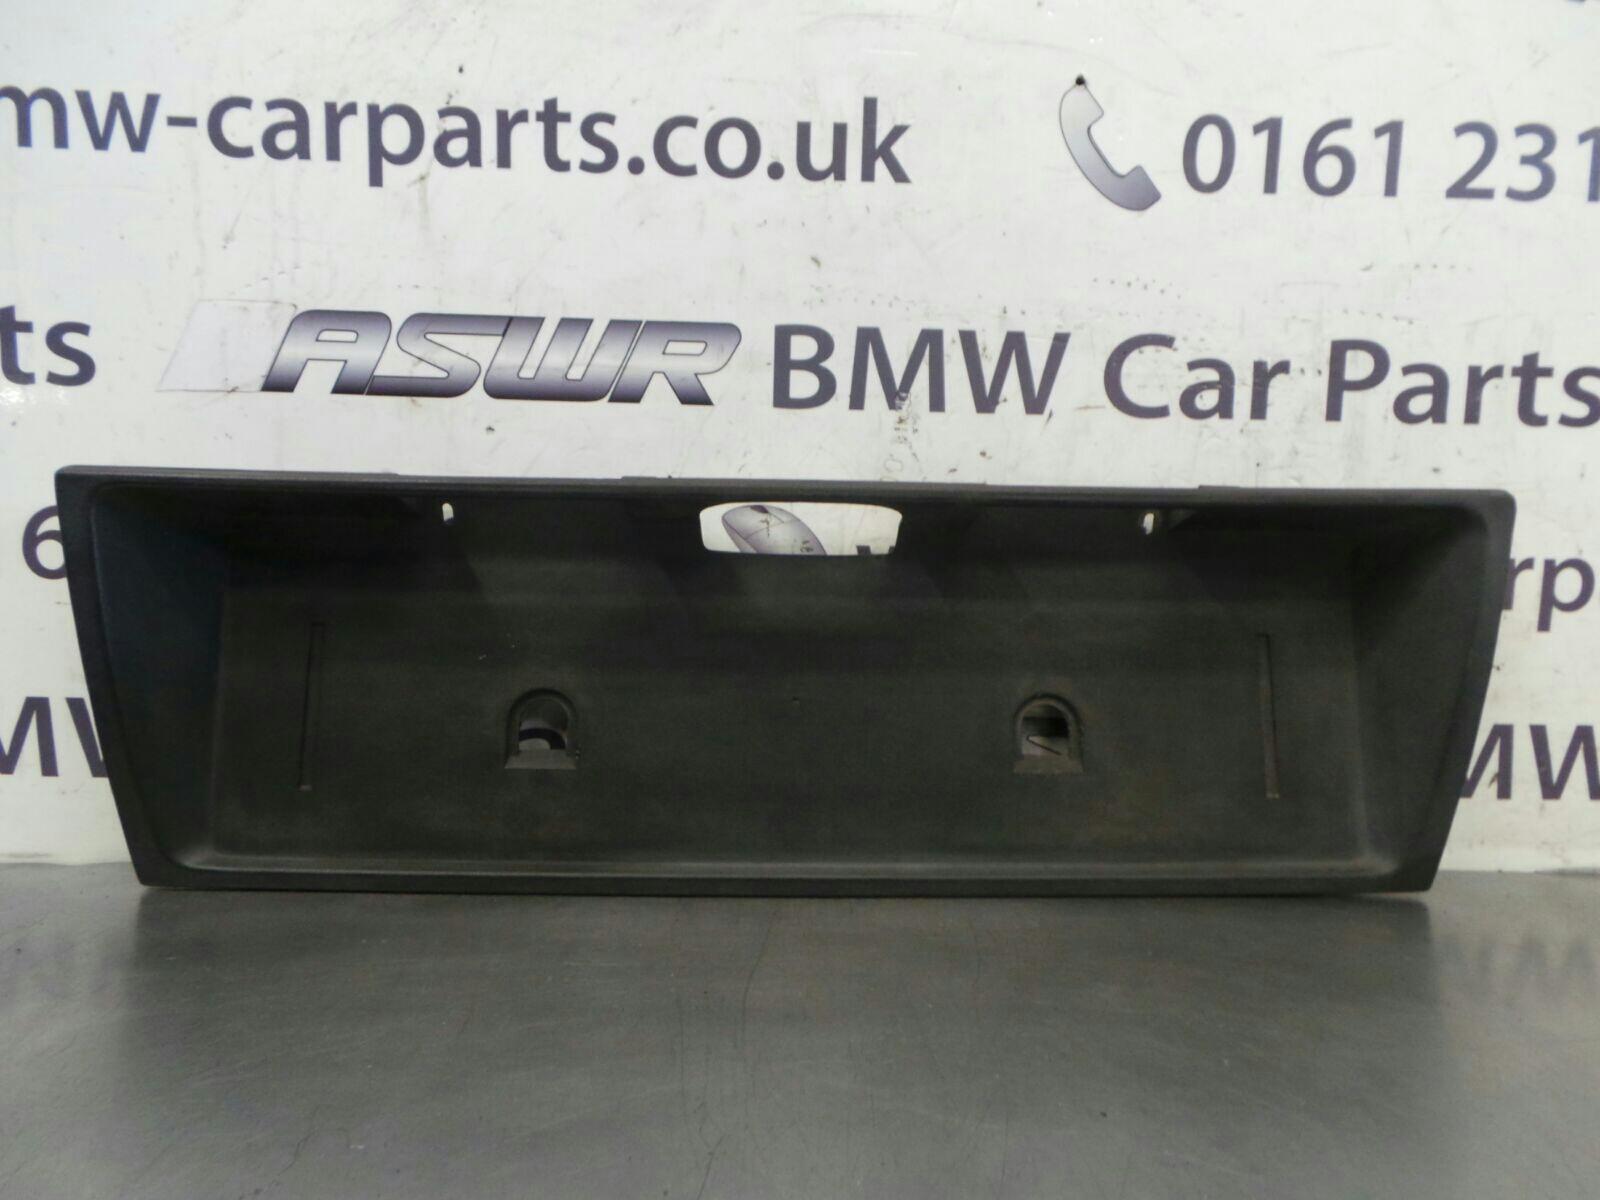 BMW E30 3 SERIES Number Plate Holder/Plinth 51131961241 & BMW E30 3 SERIES Number Plate Holder/Plinth 51131961241 breaking for ...